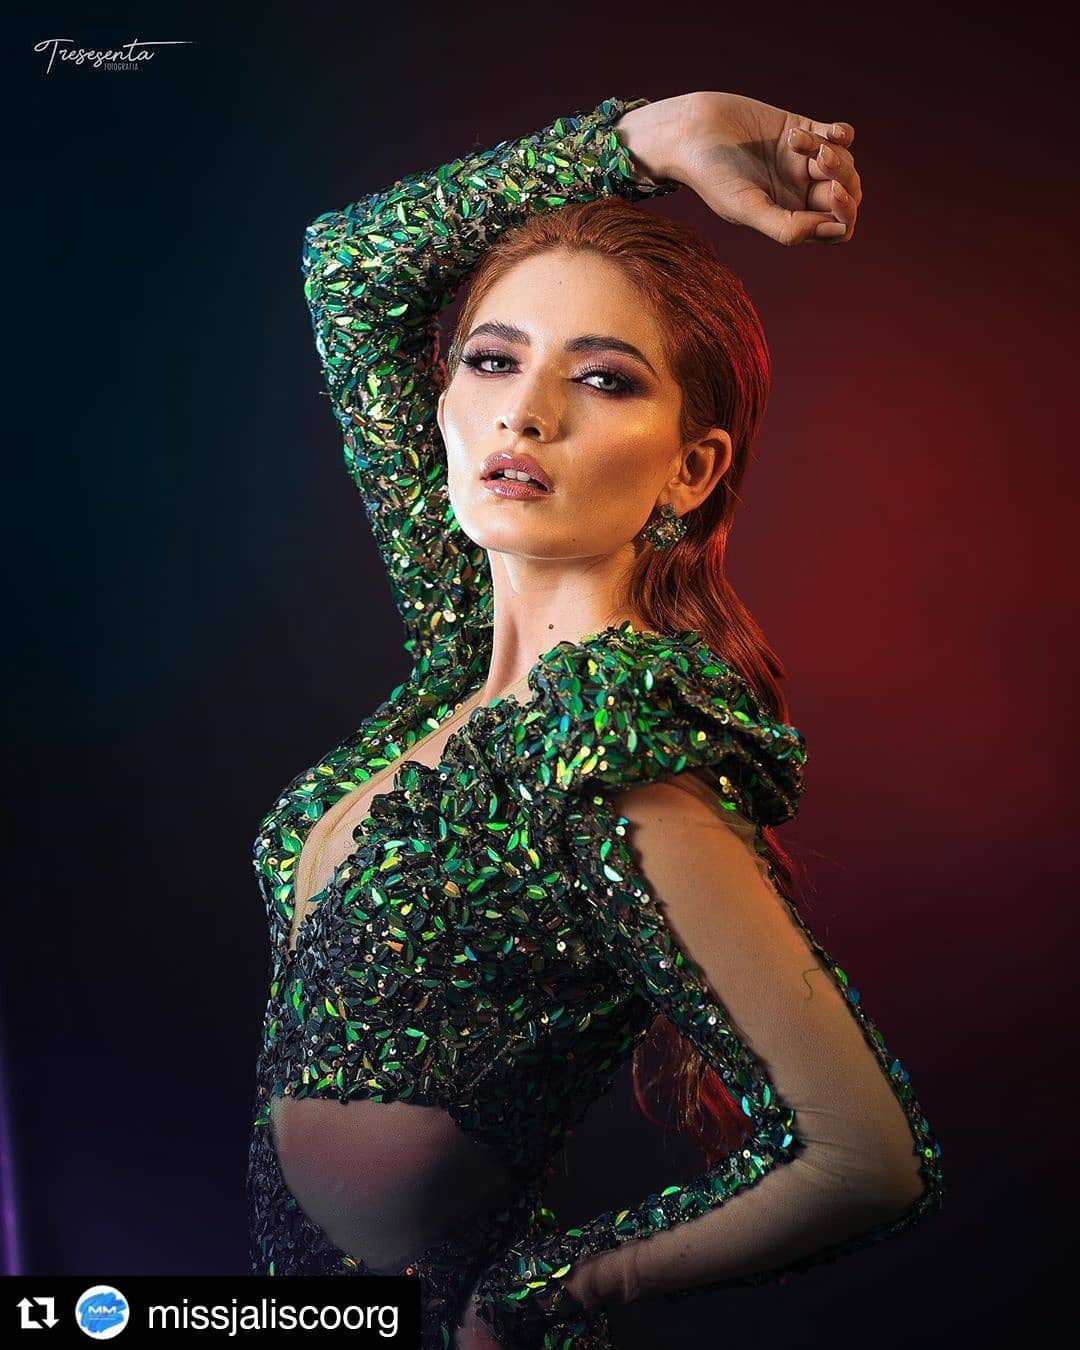 citlaly torres, top 12 de miss grand mexico 2020. 10489410